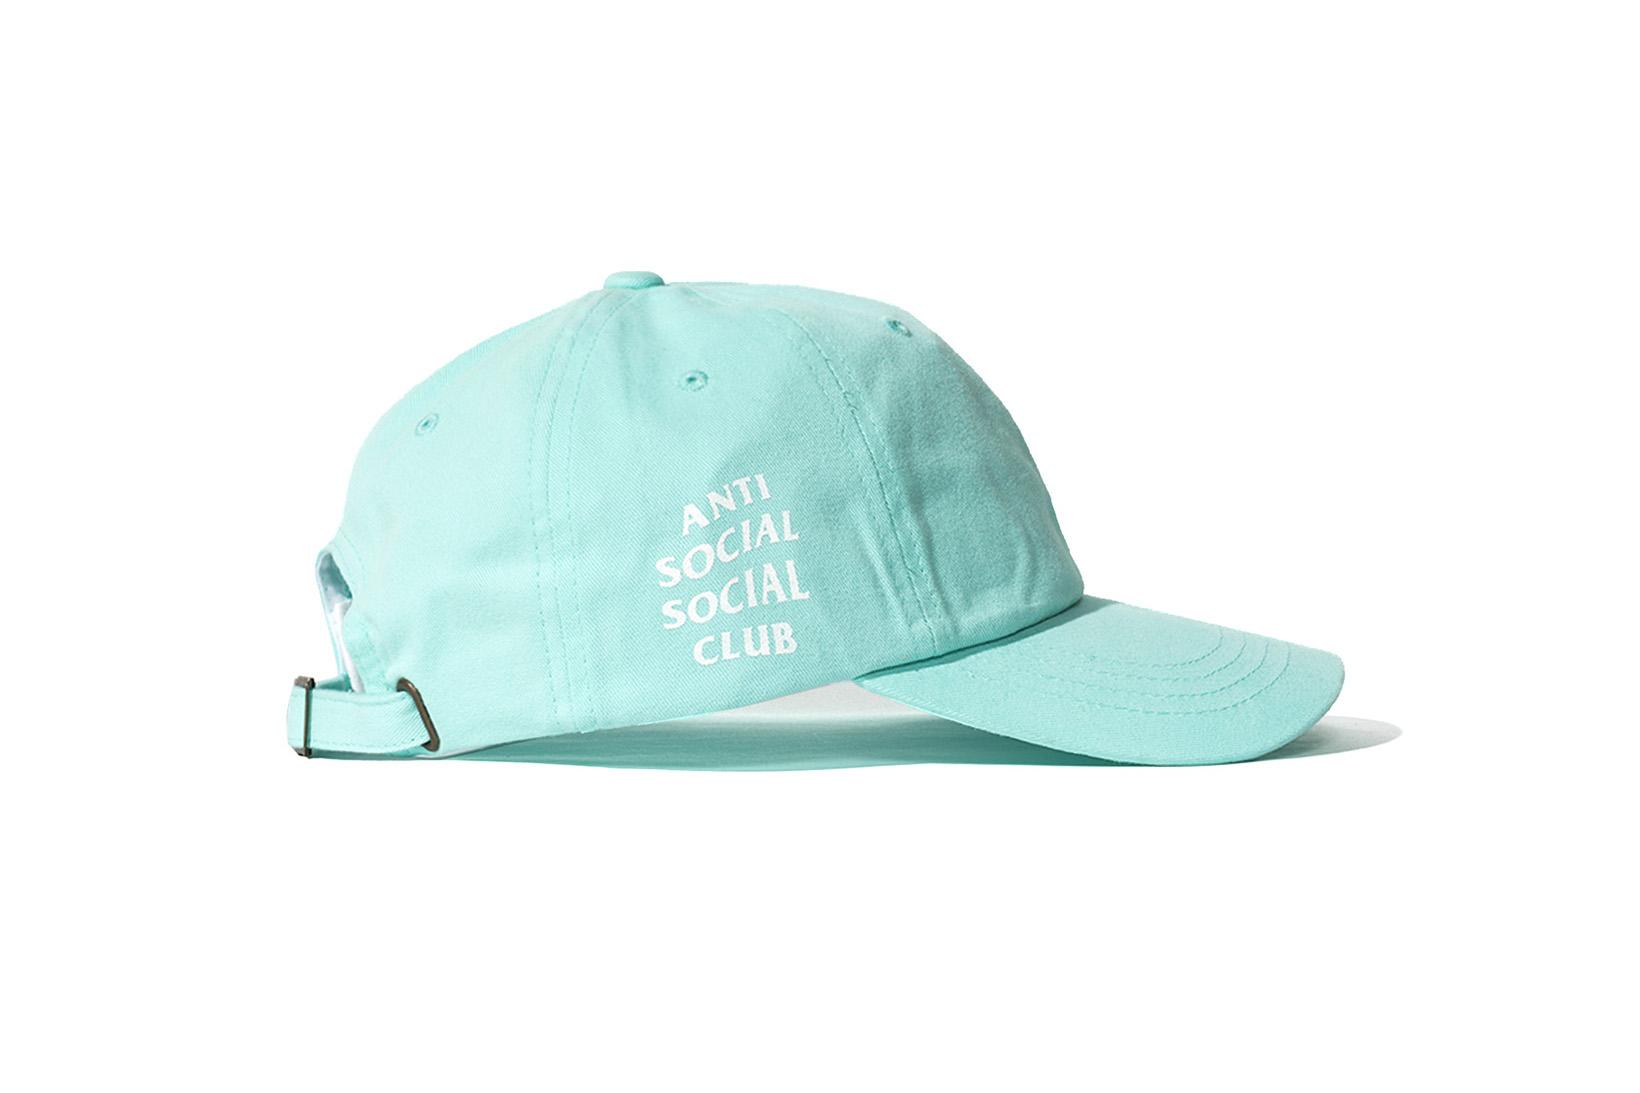 Anti Social Social Club 2017 Spring Summer - 3744376